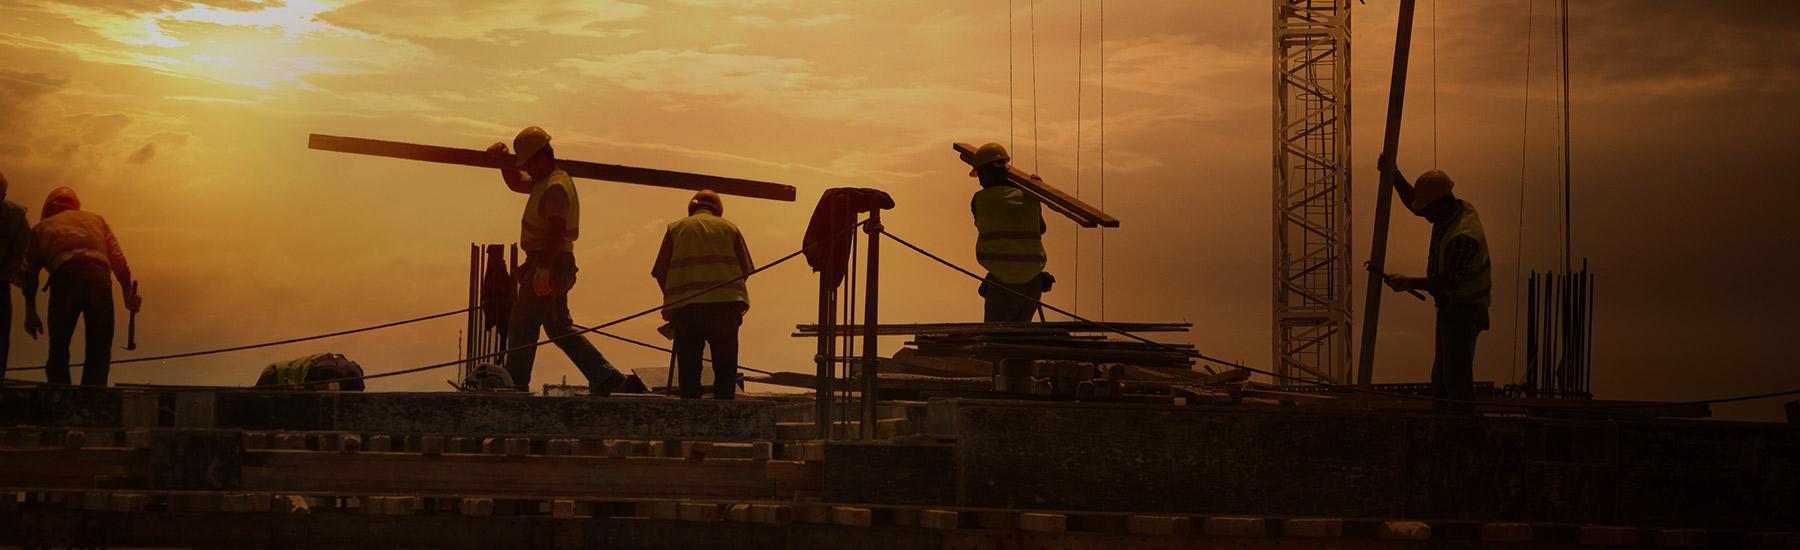 Commercial Subcontractors